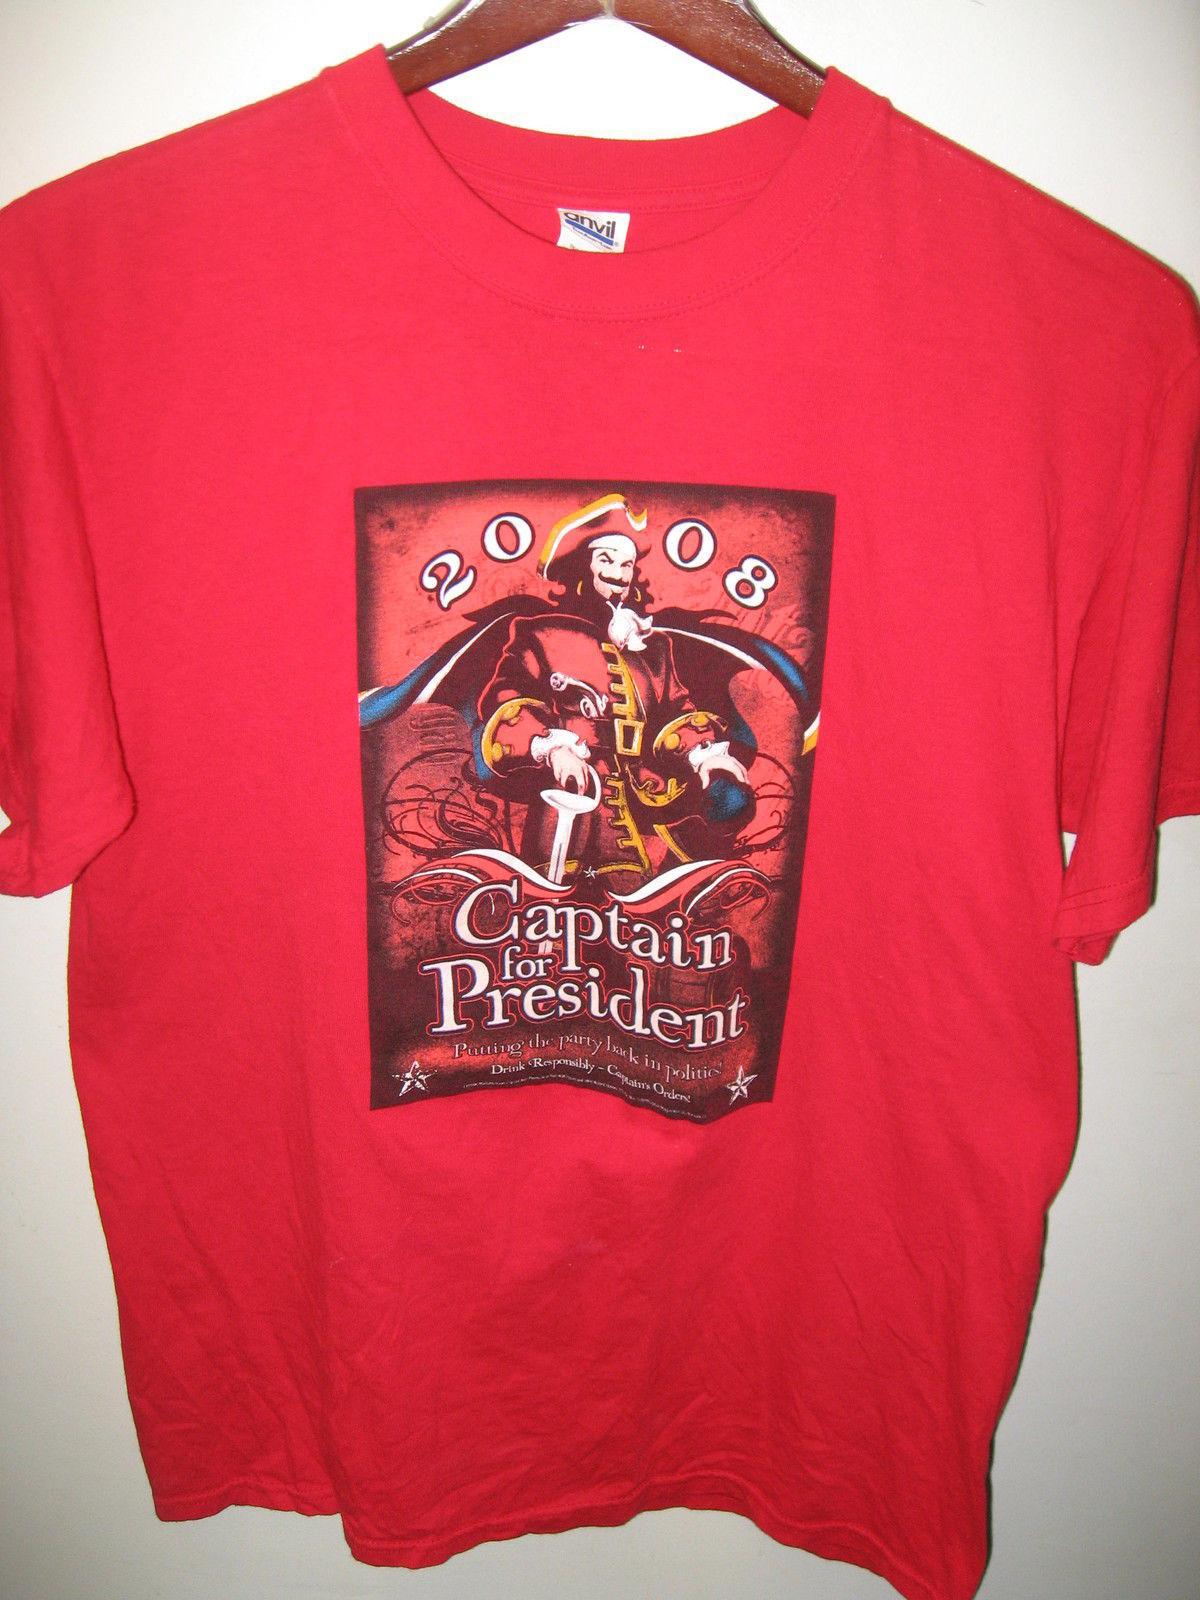 captain morgan spiced rum 2008 pirate for president cocktail bar pub t shirt lrg t shirts. Black Bedroom Furniture Sets. Home Design Ideas